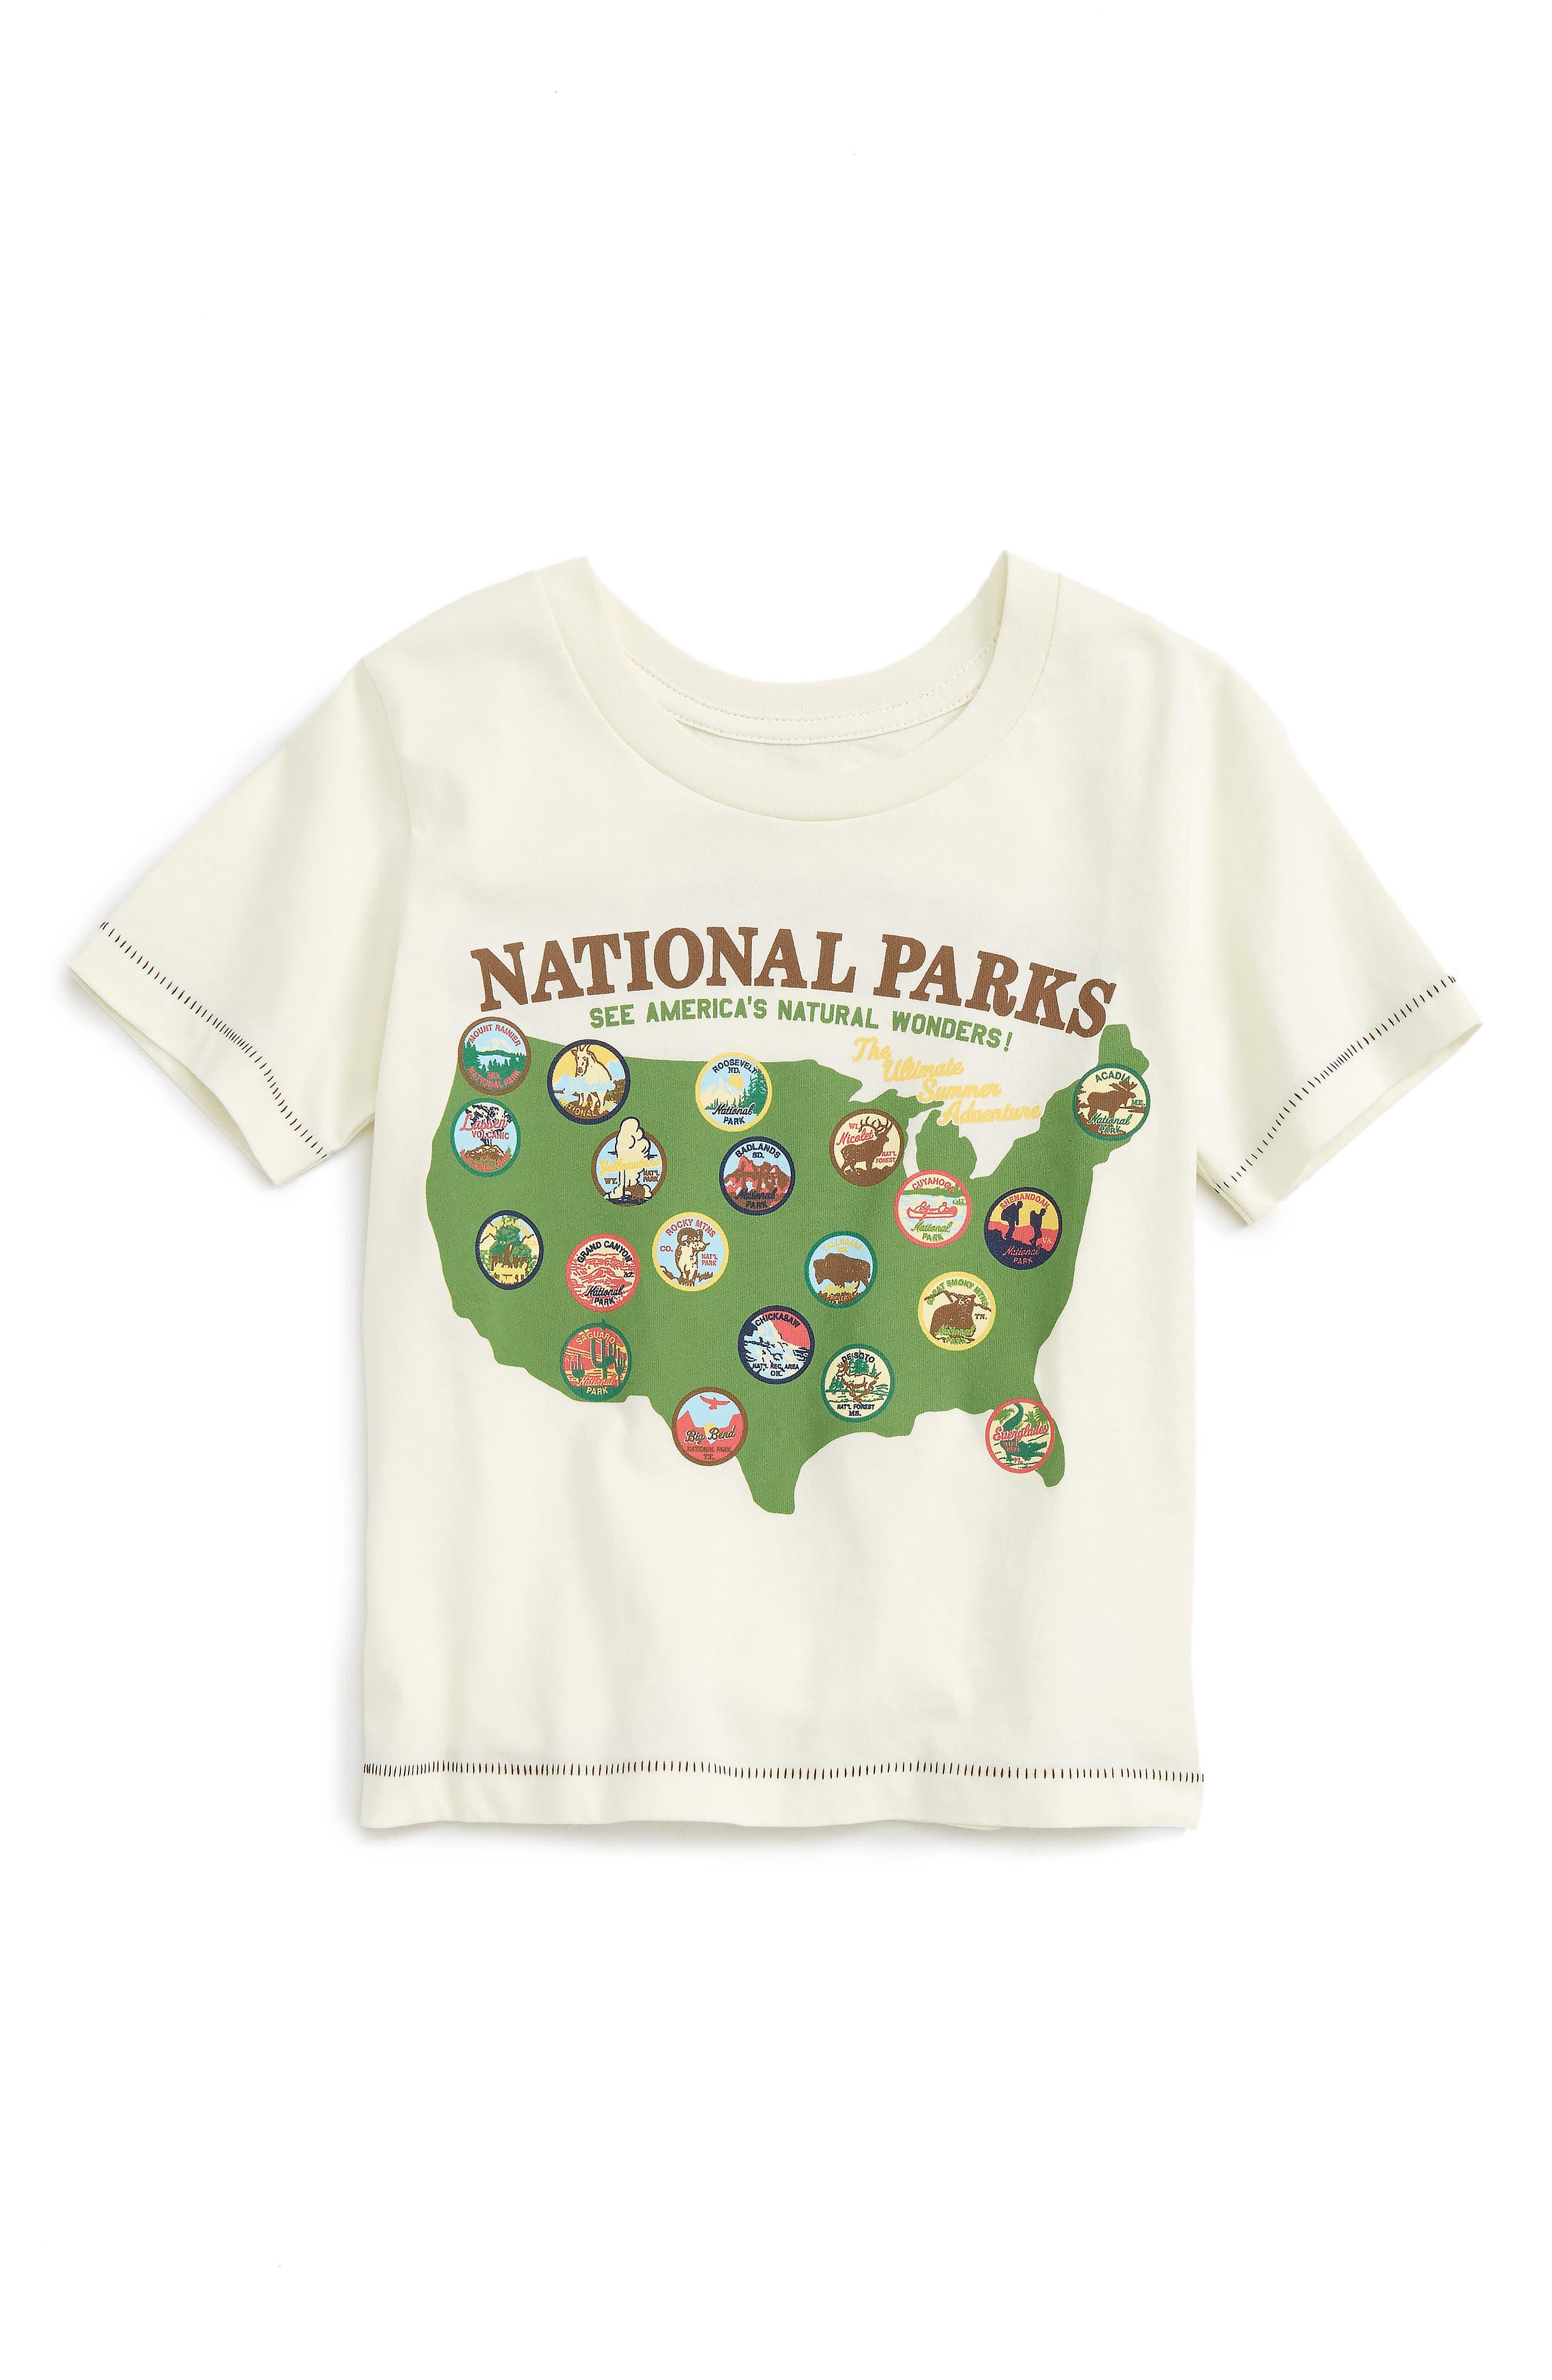 Main Image - Peek National Parks T-Shirt (Toddler Kids, Little Kids & Big Kids)